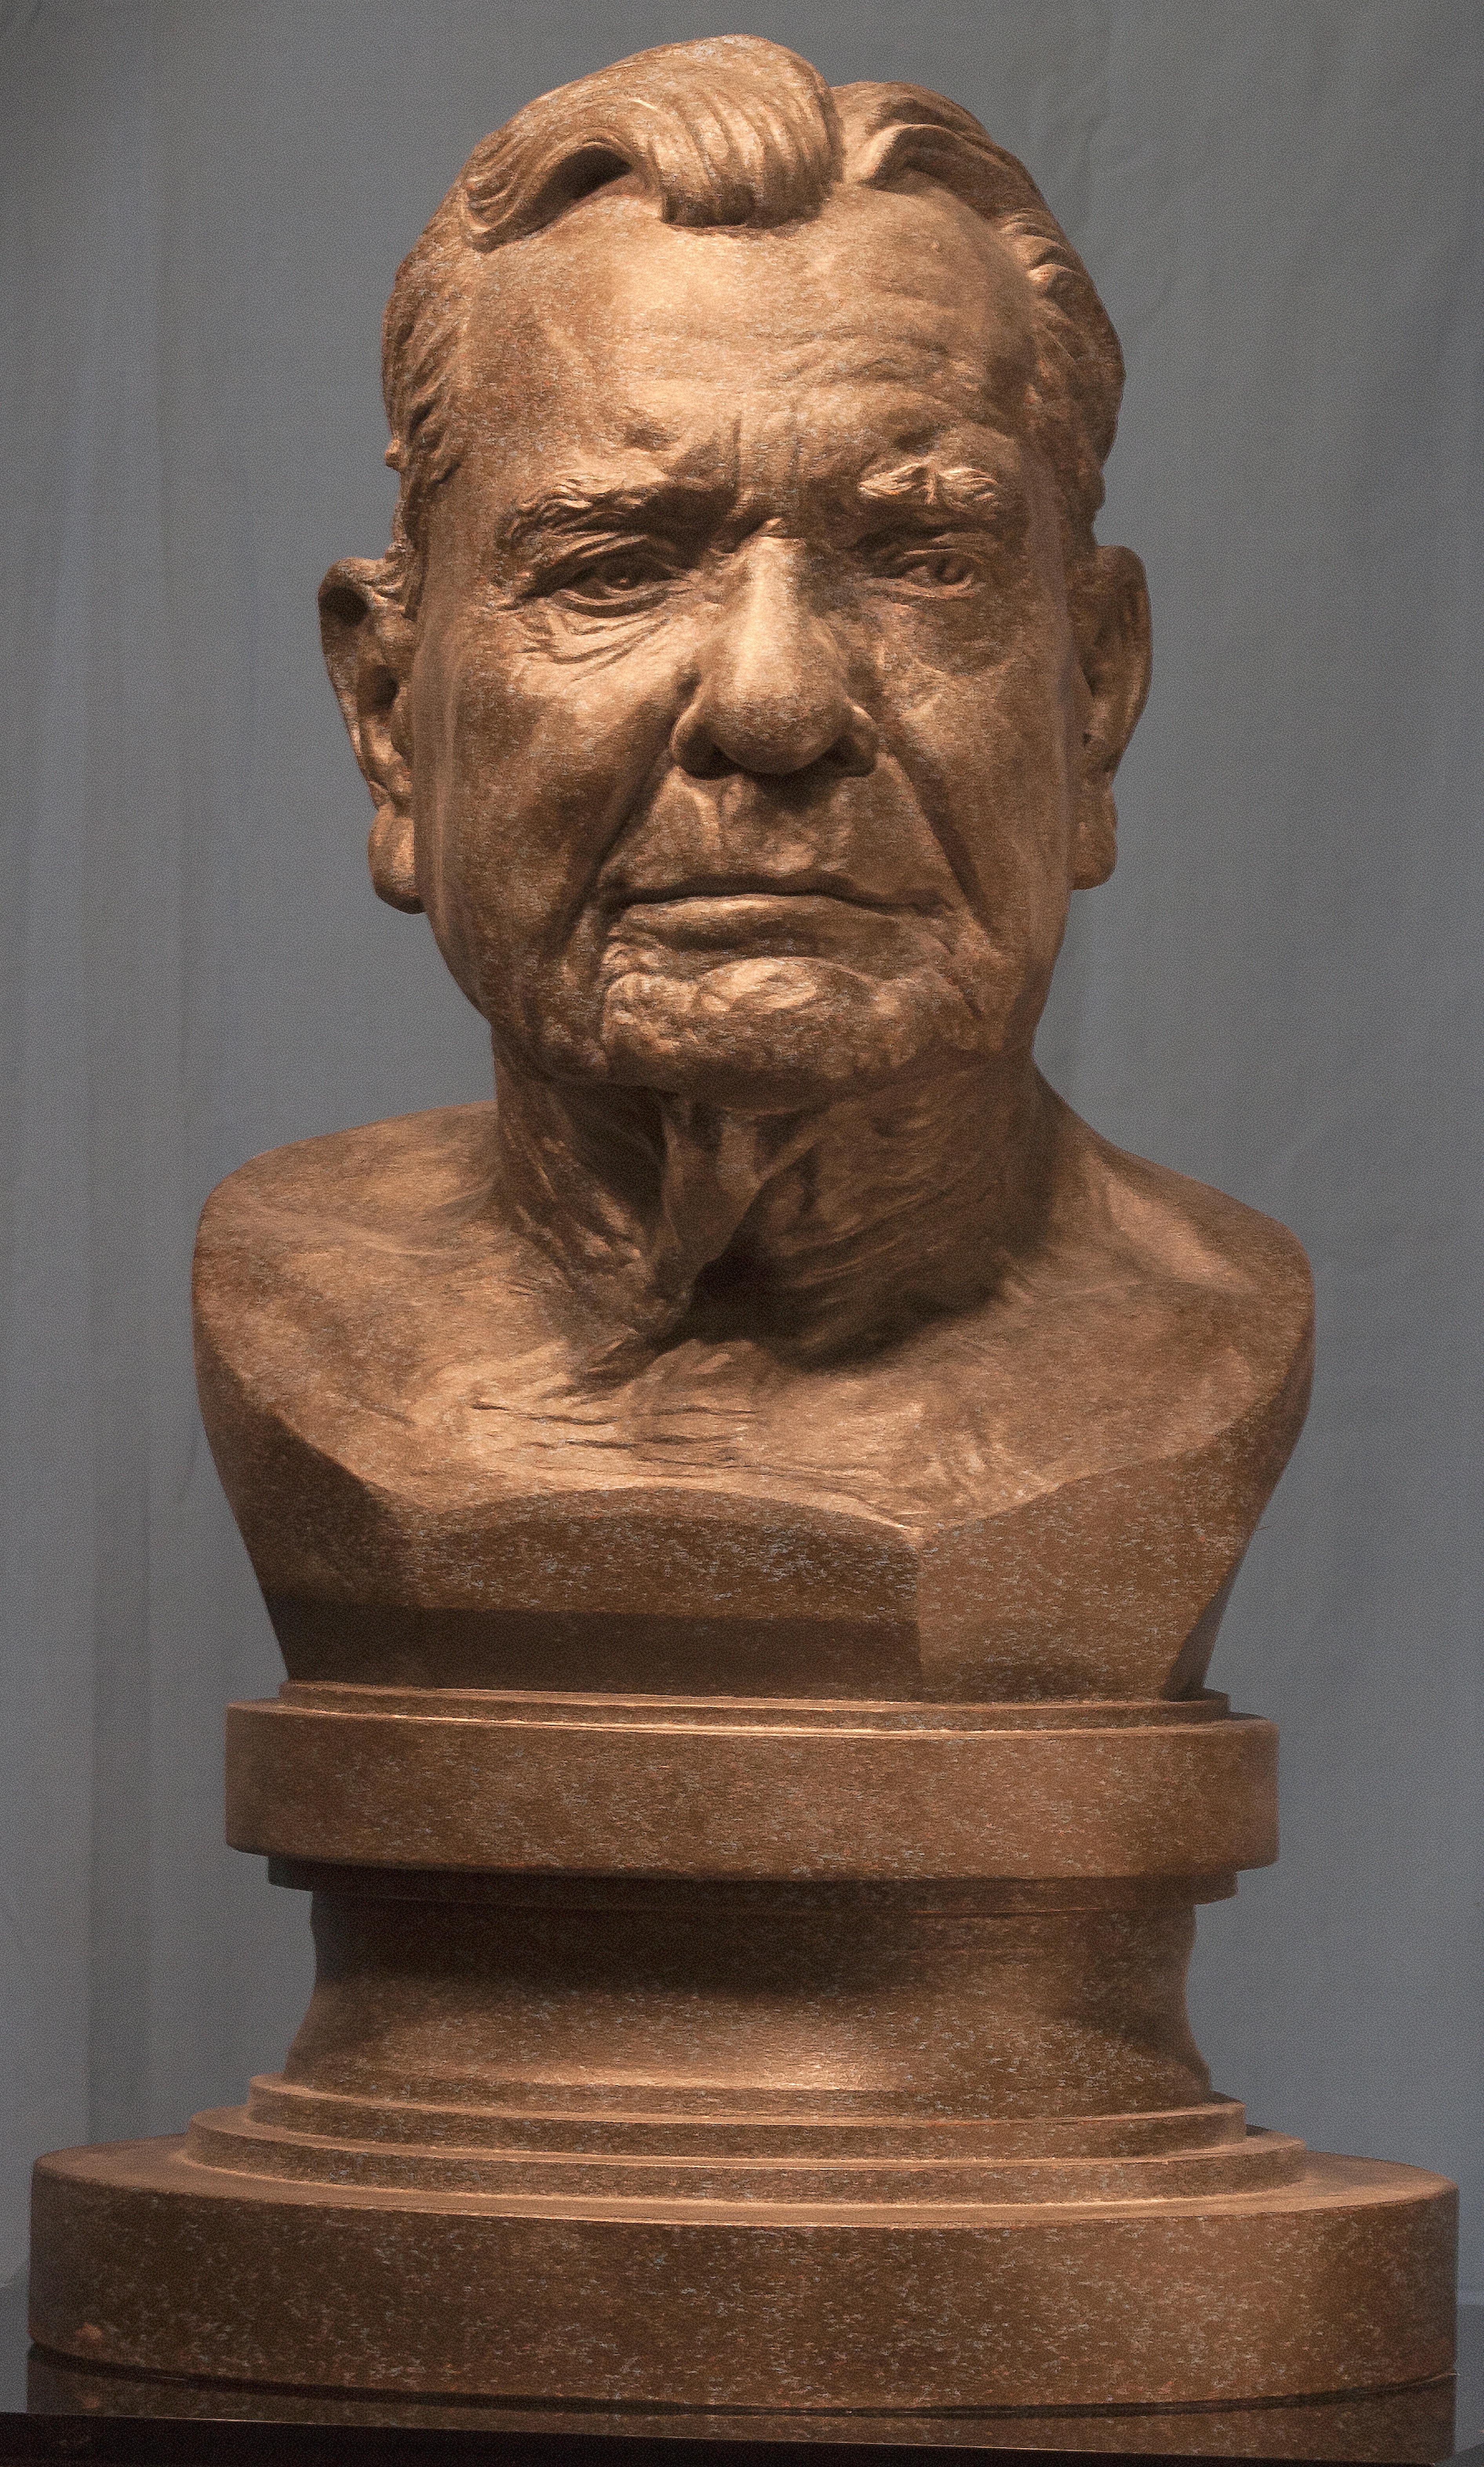 Mr. Flues, cast with patina